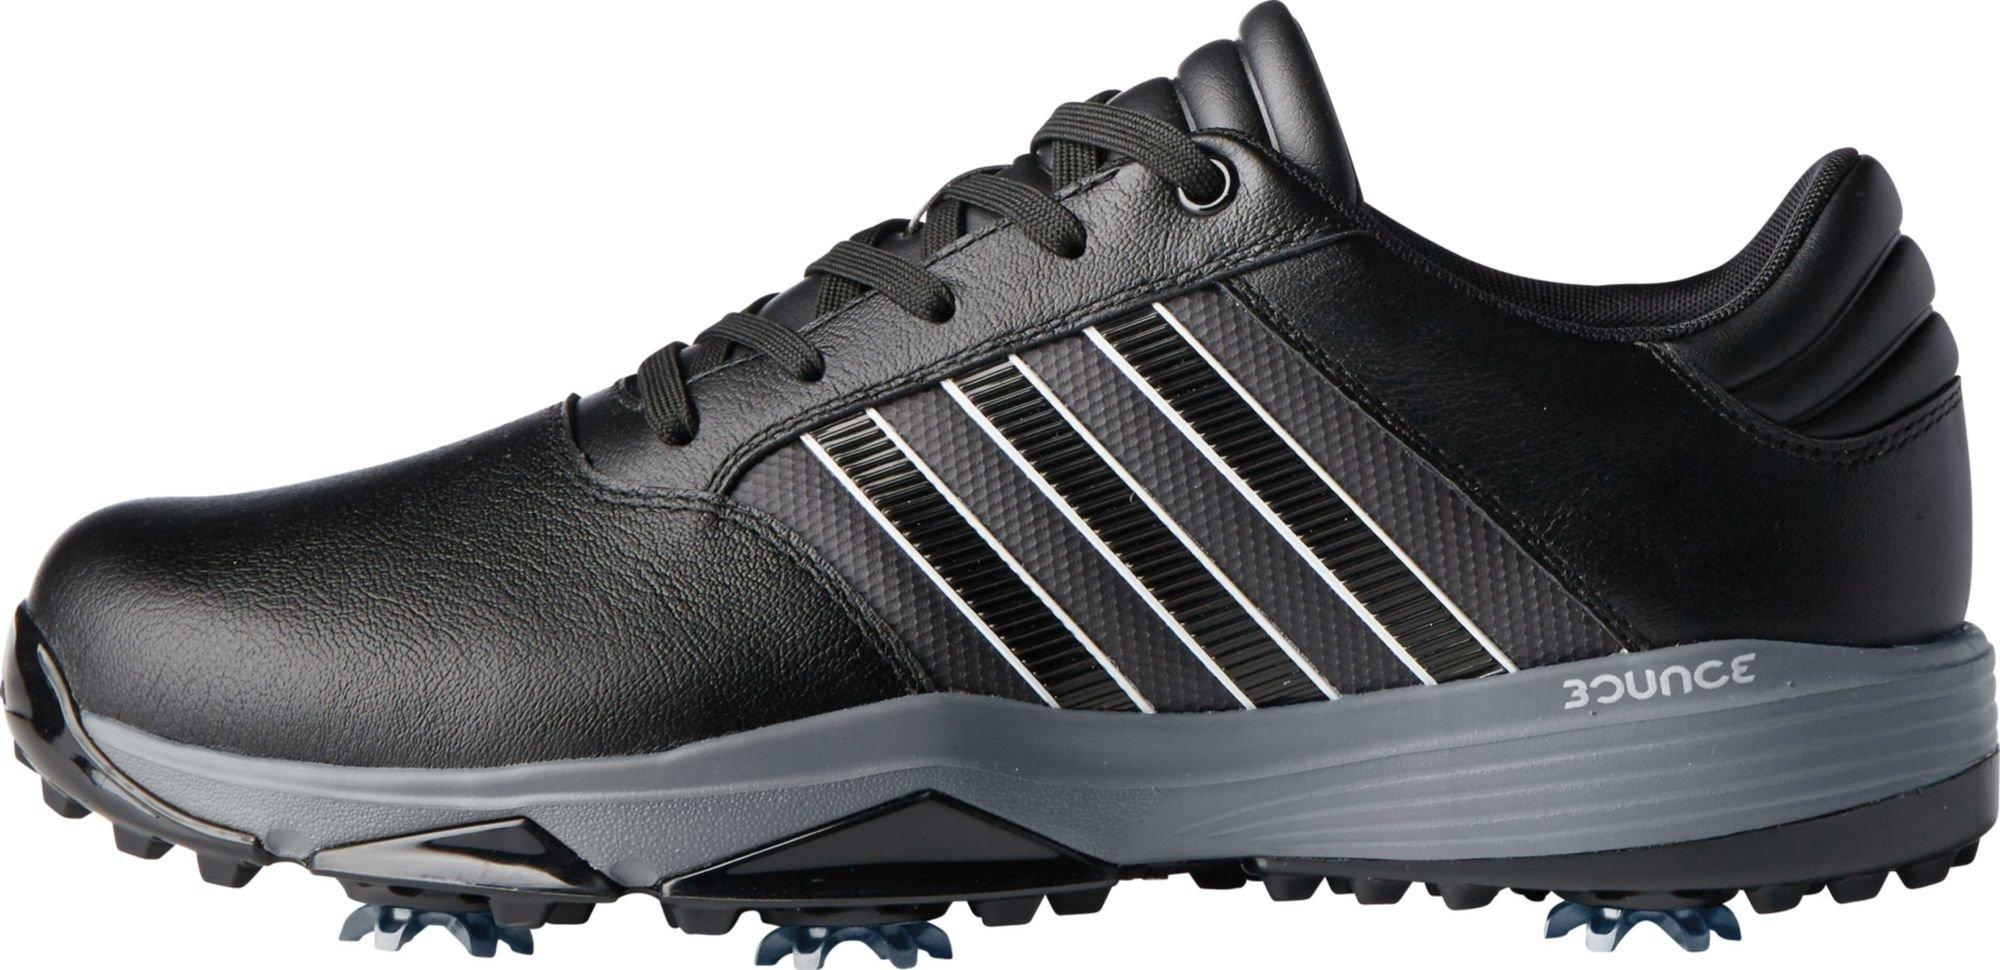 360 Bounce Golf Shoes Black